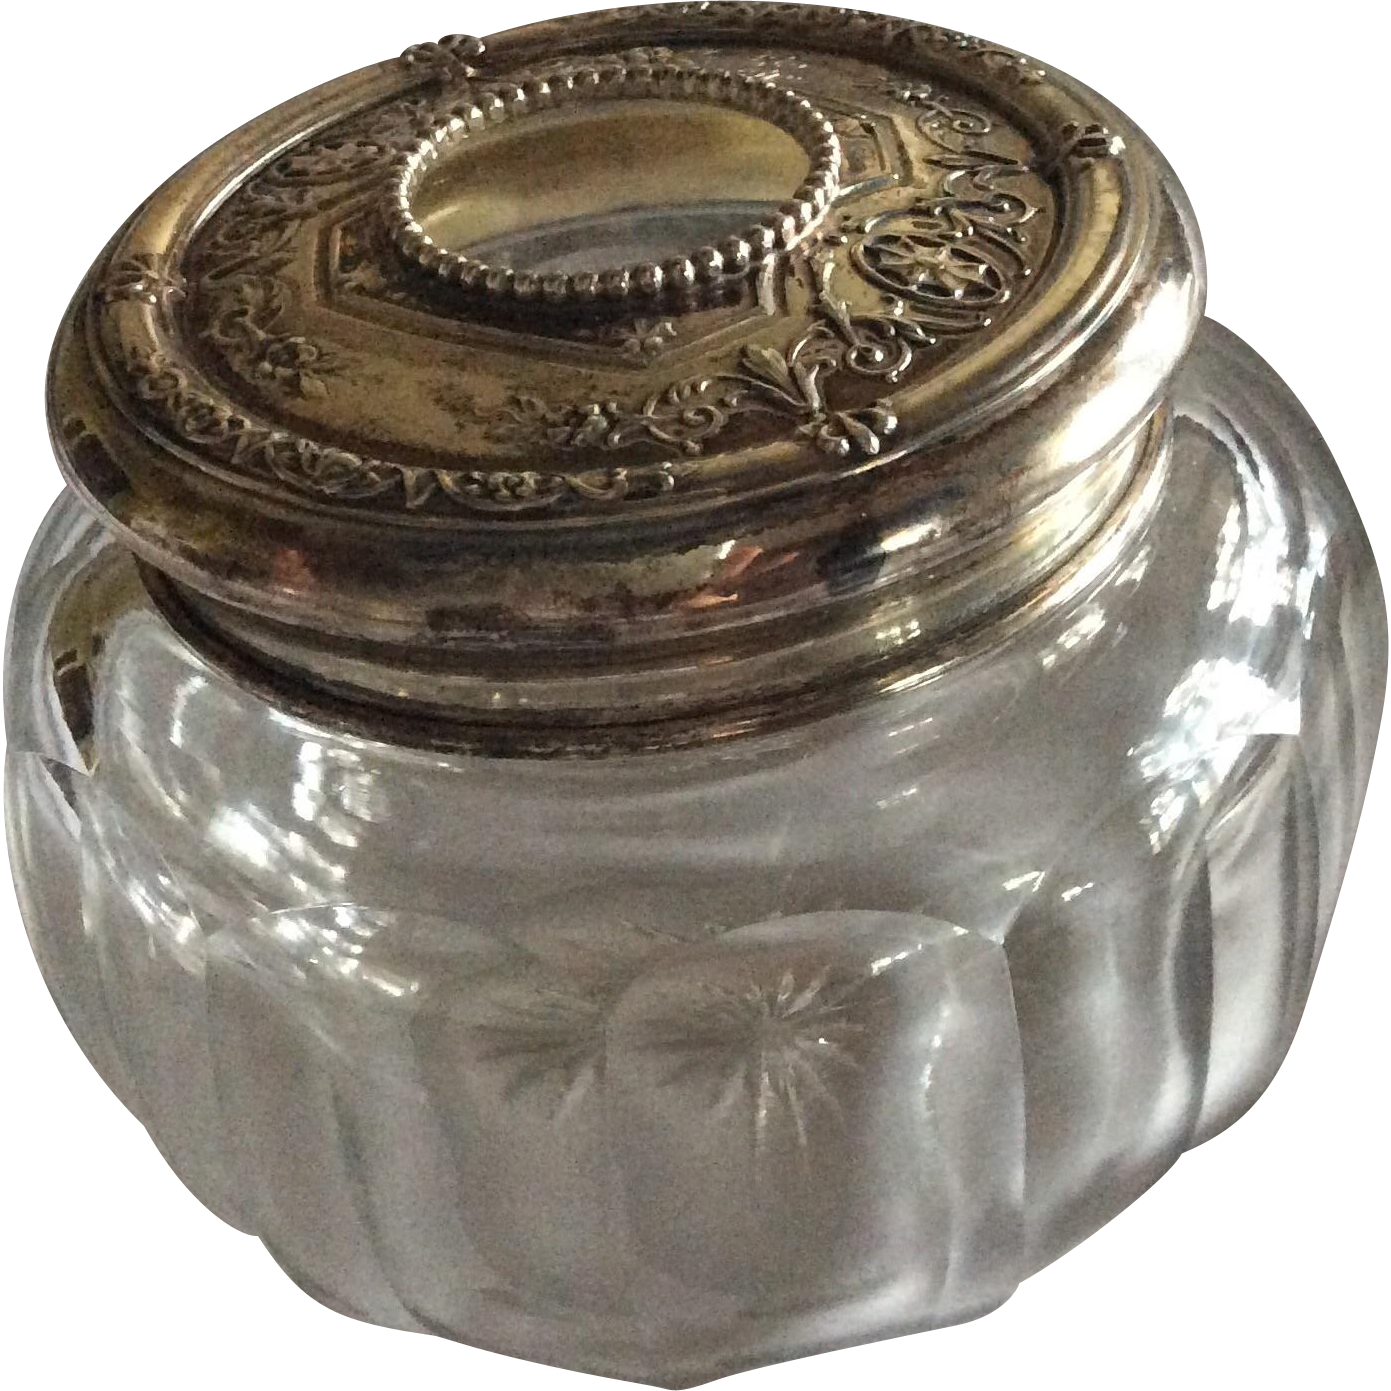 Ornate Sterling silver Topped Hair Receiver Dresser Jar